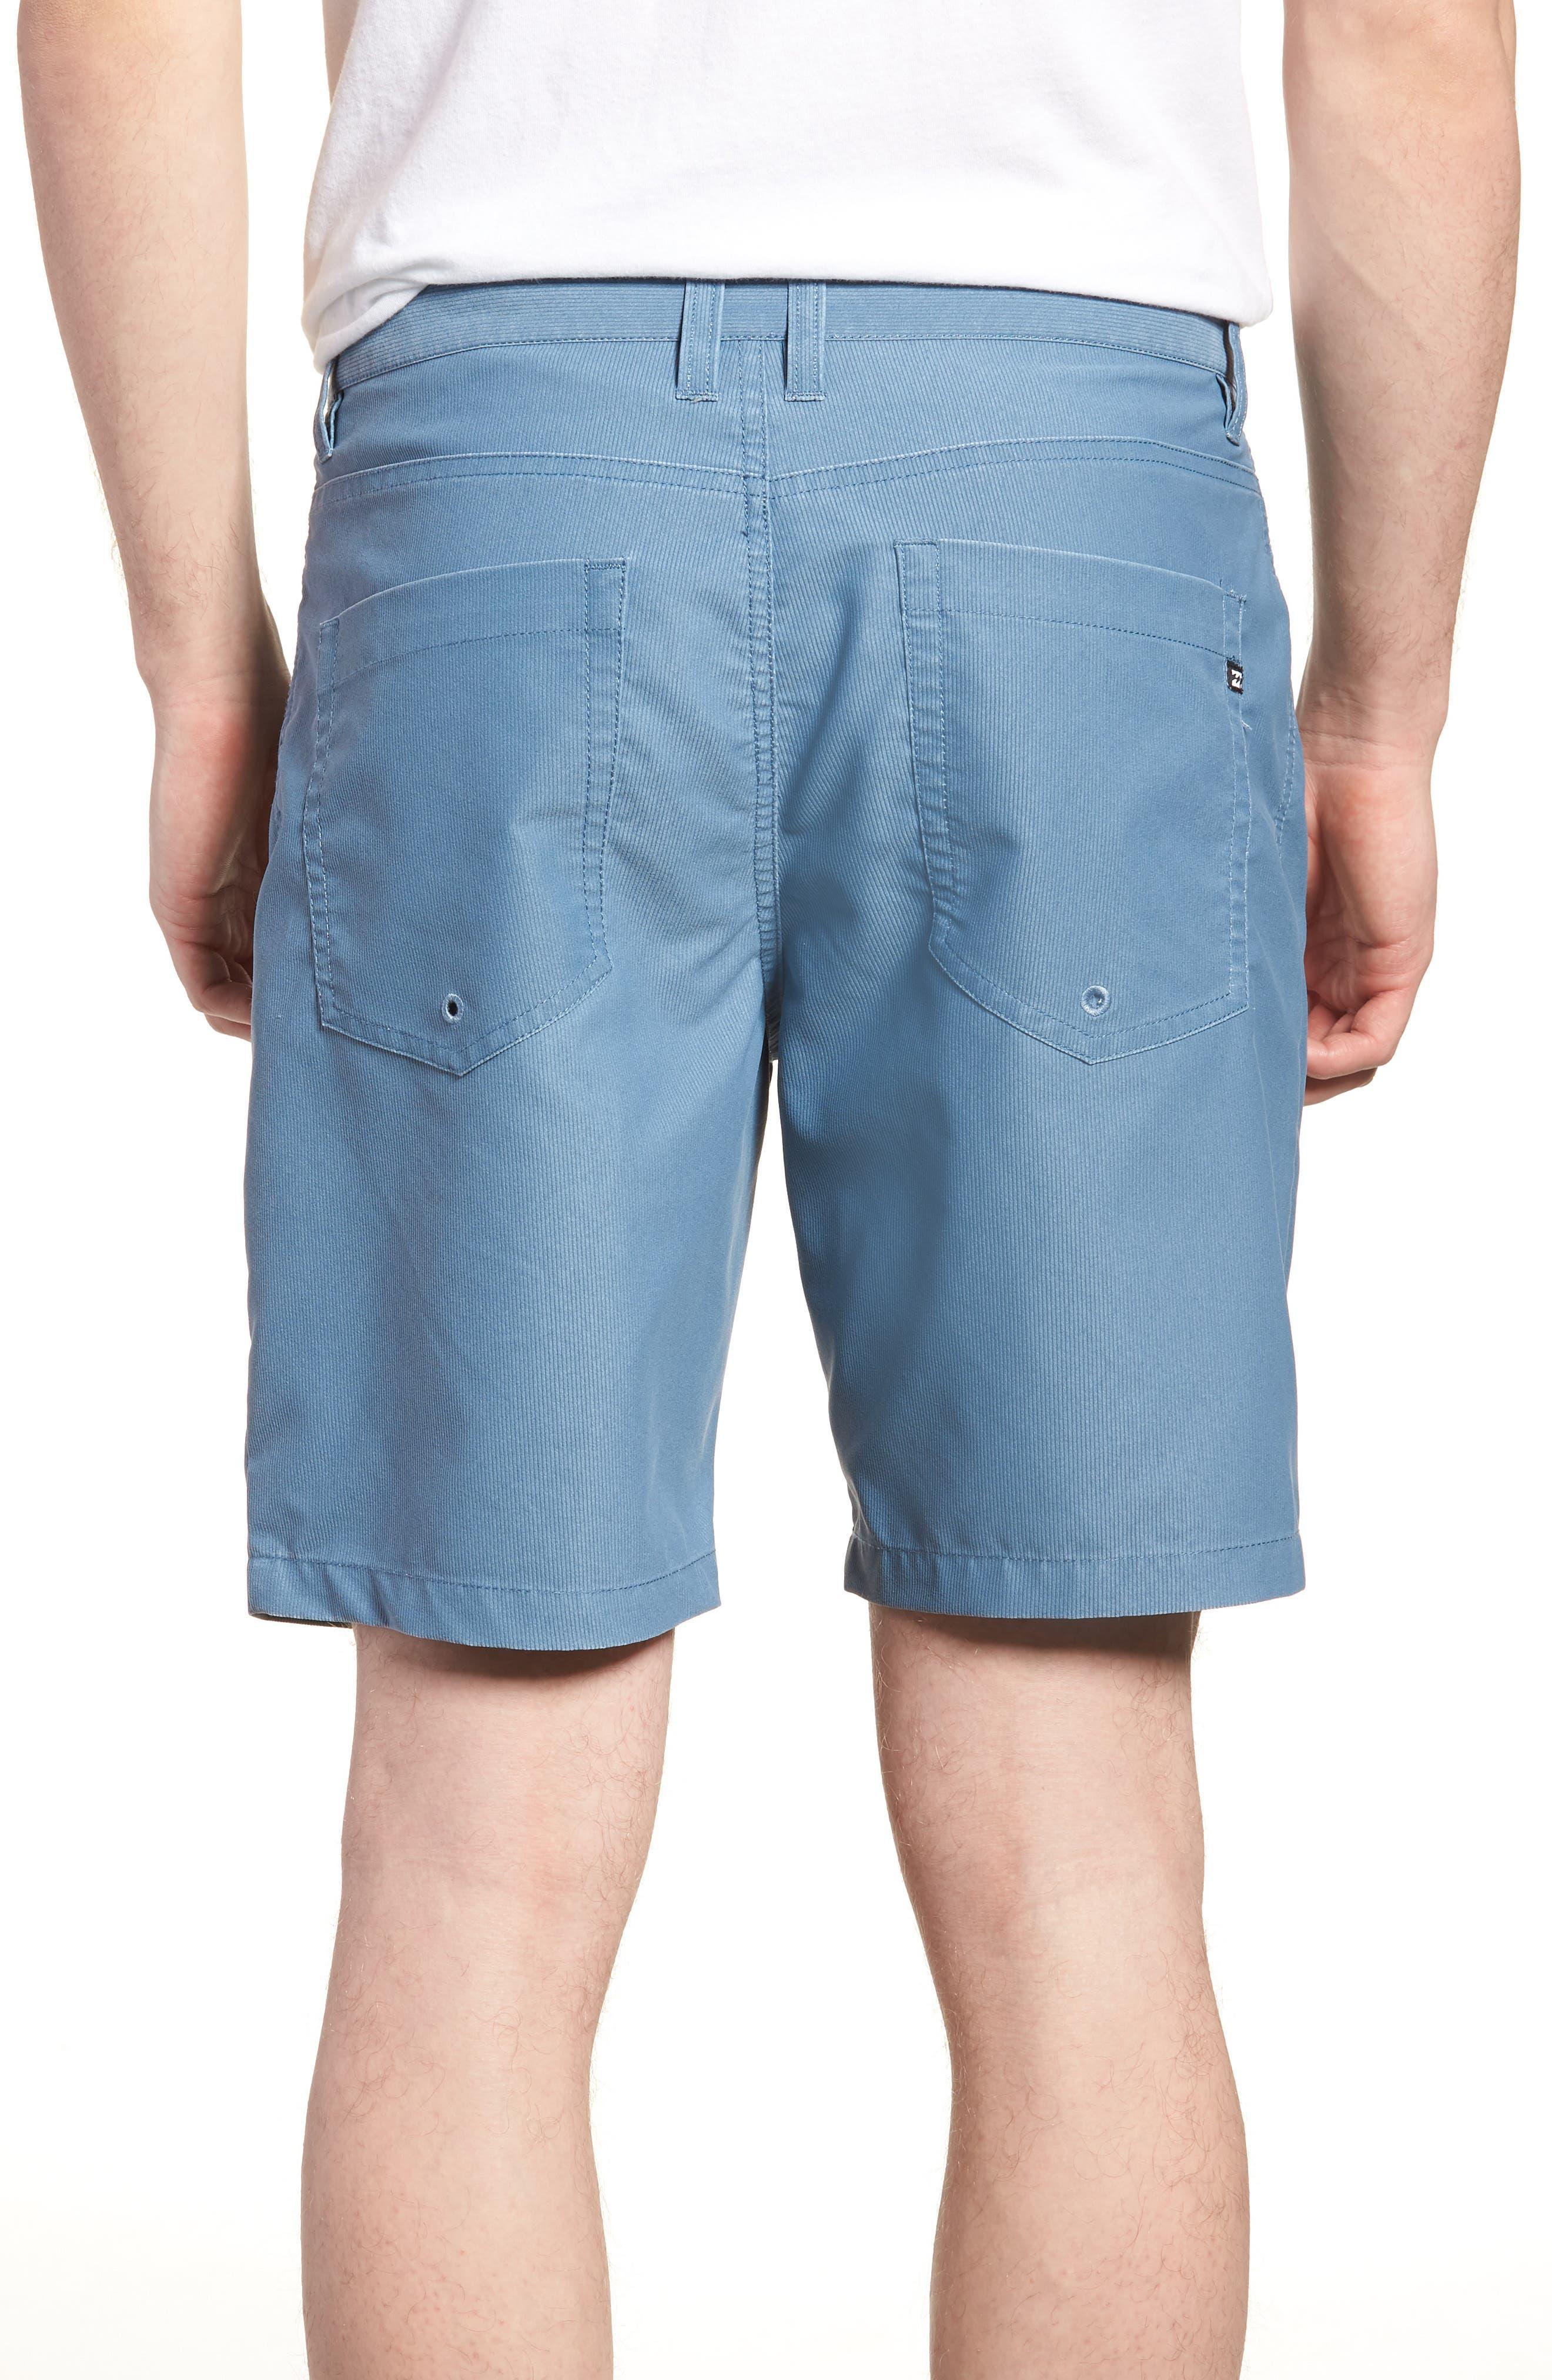 Outsider X Surf Corduroy Shorts,                             Alternate thumbnail 2, color,                             Powder Blue